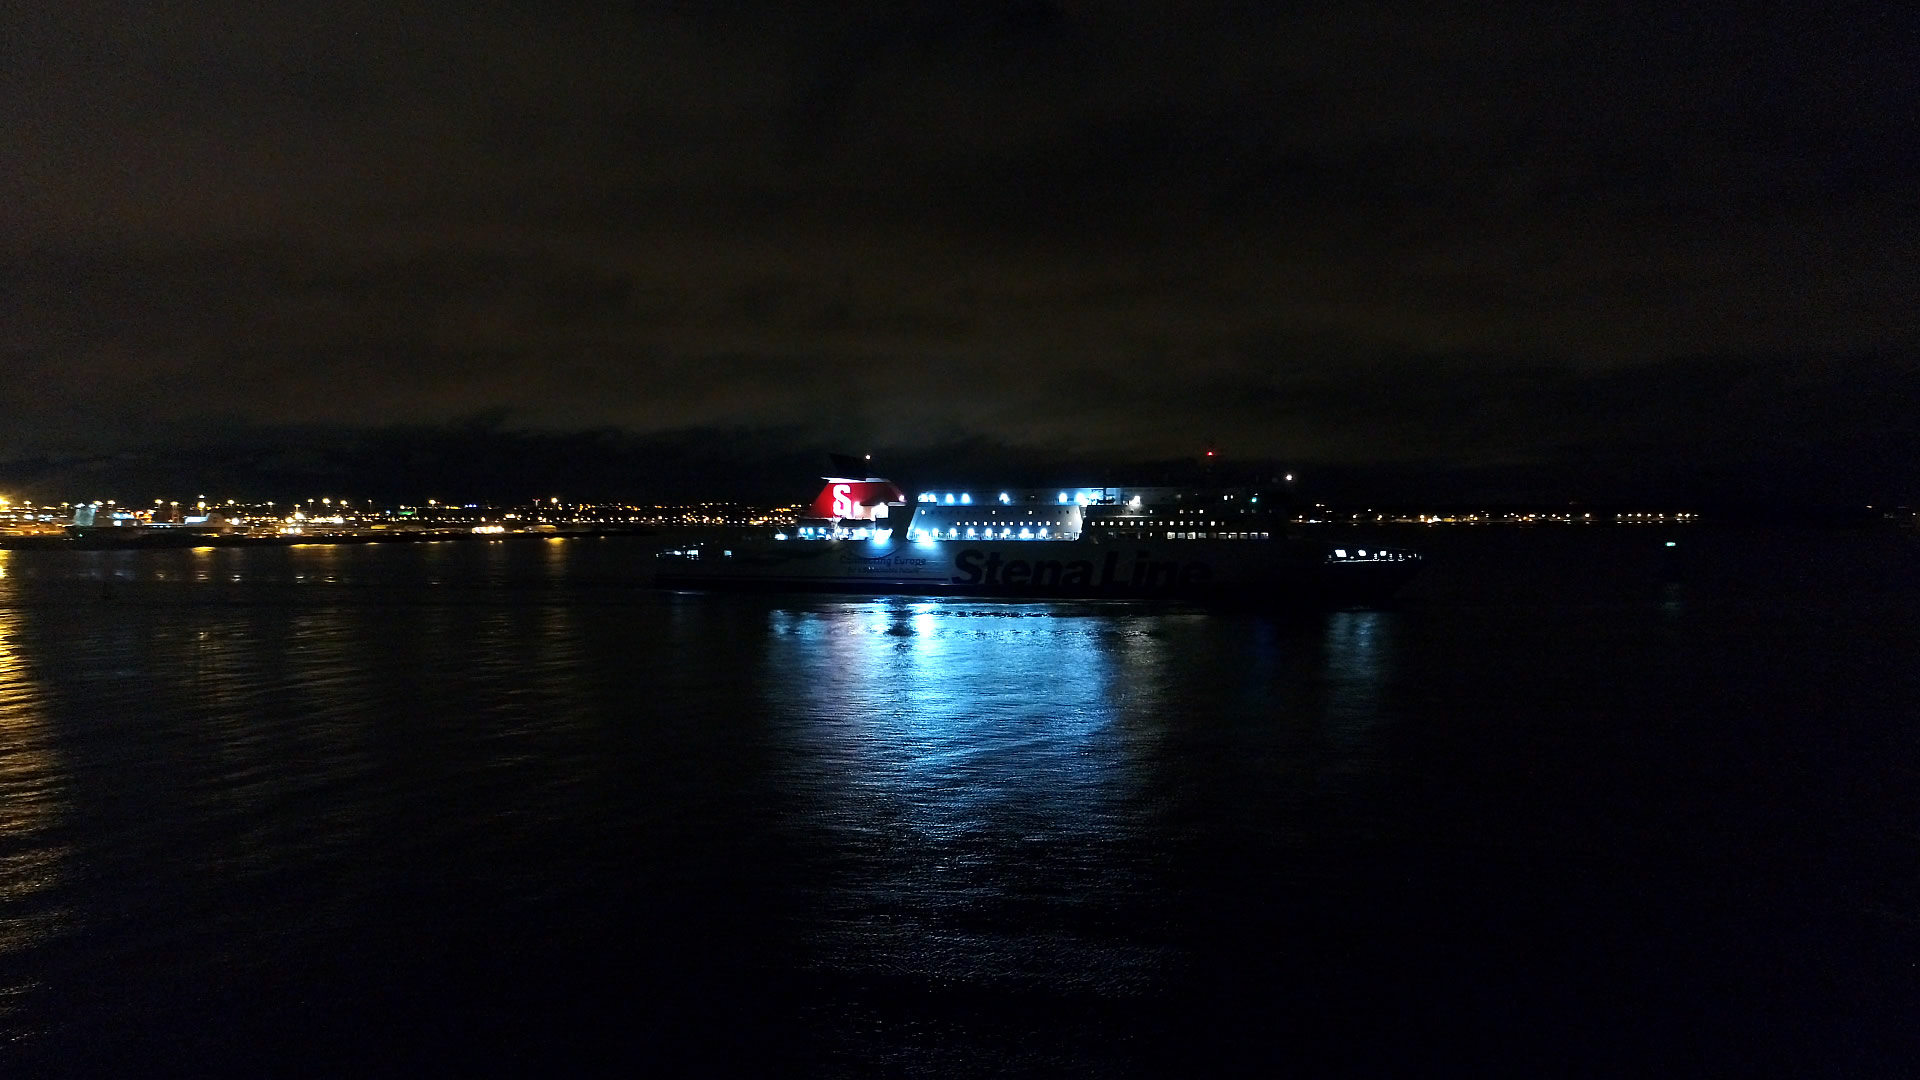 Poolbeg Stena Line Ferry 4